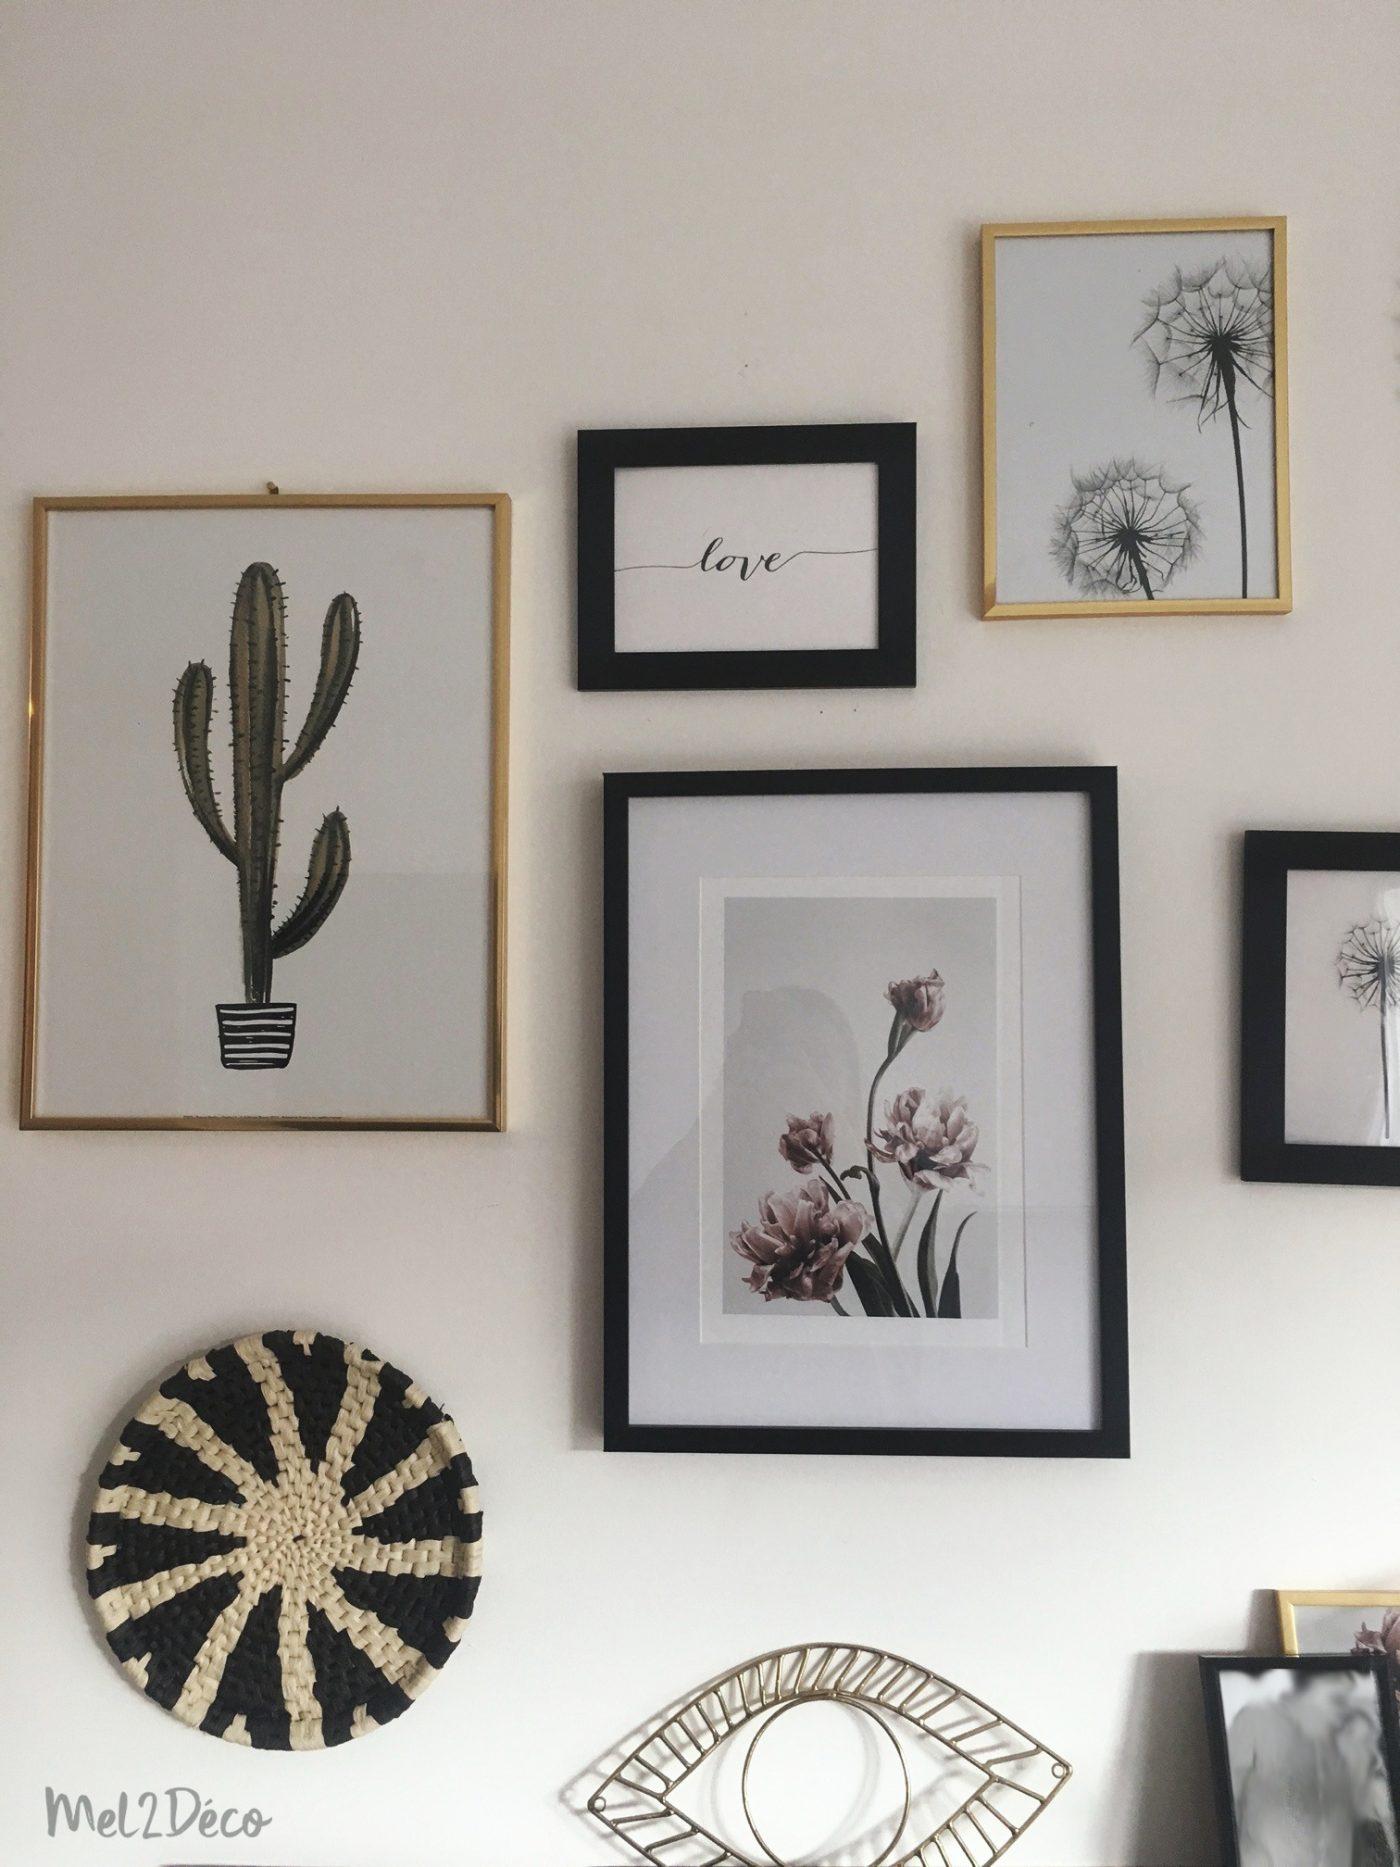 mon mur de cadre ador dor blog z dio. Black Bedroom Furniture Sets. Home Design Ideas